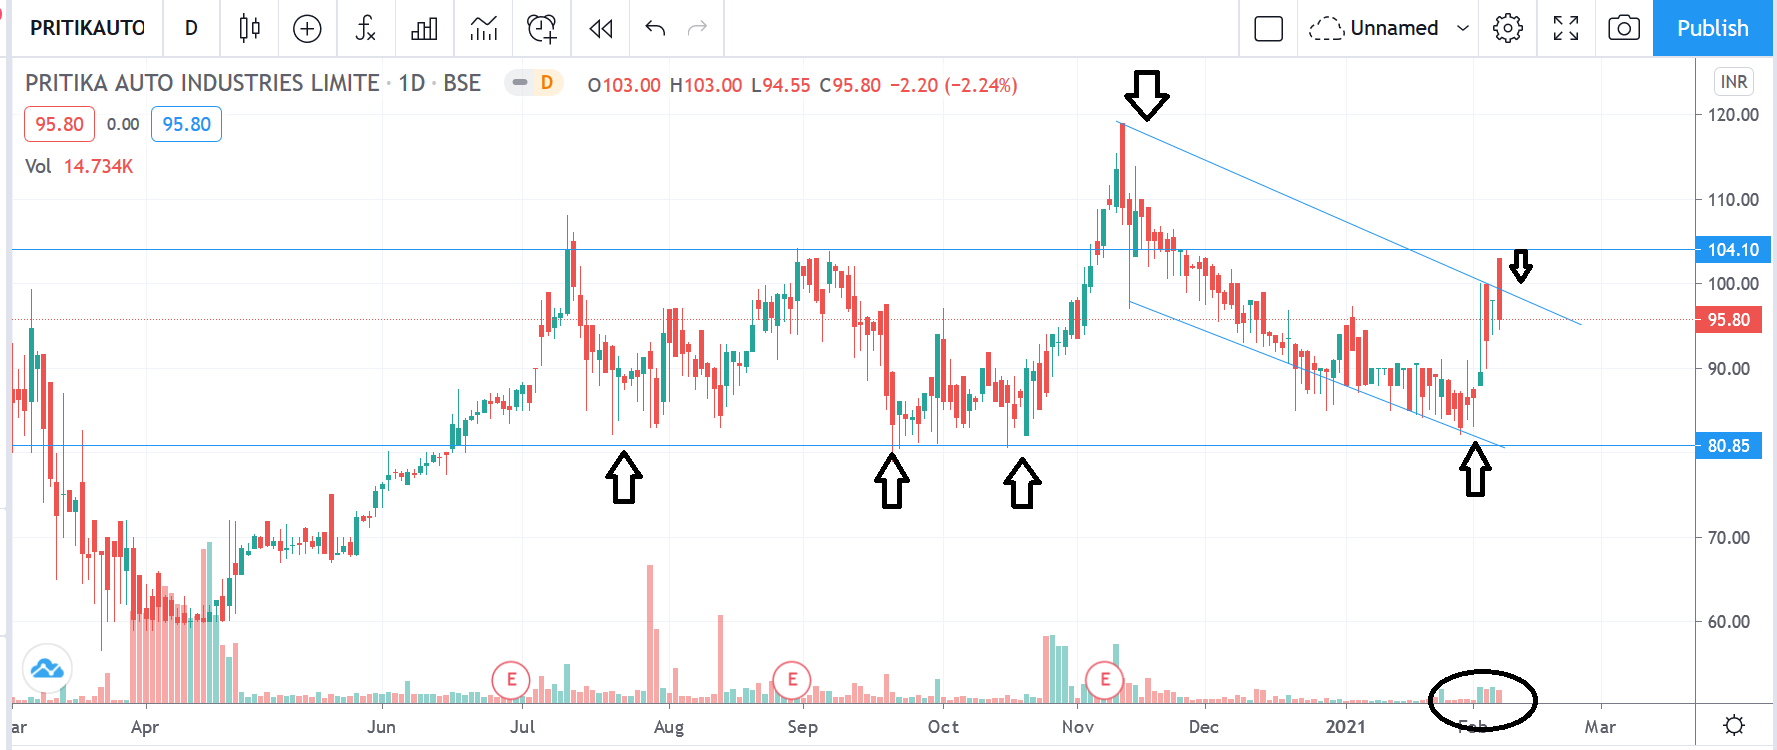 Small Cap Breakout Stock : Pritika Auto Industries